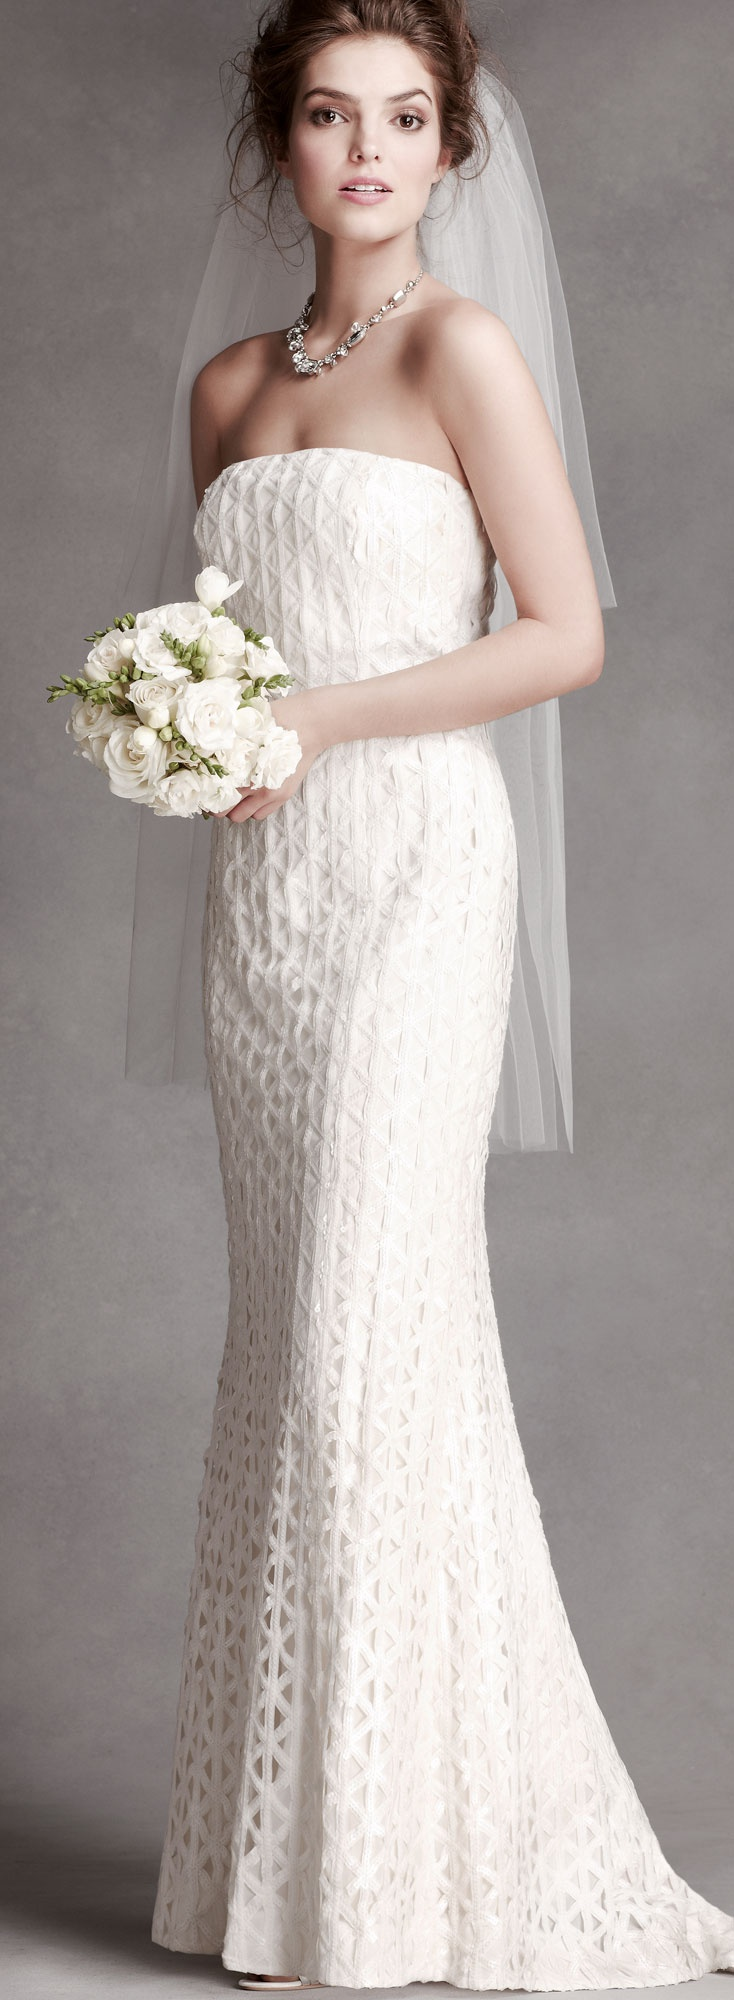 39 best Winter Wedding Gowns images on Pinterest | Short wedding ...